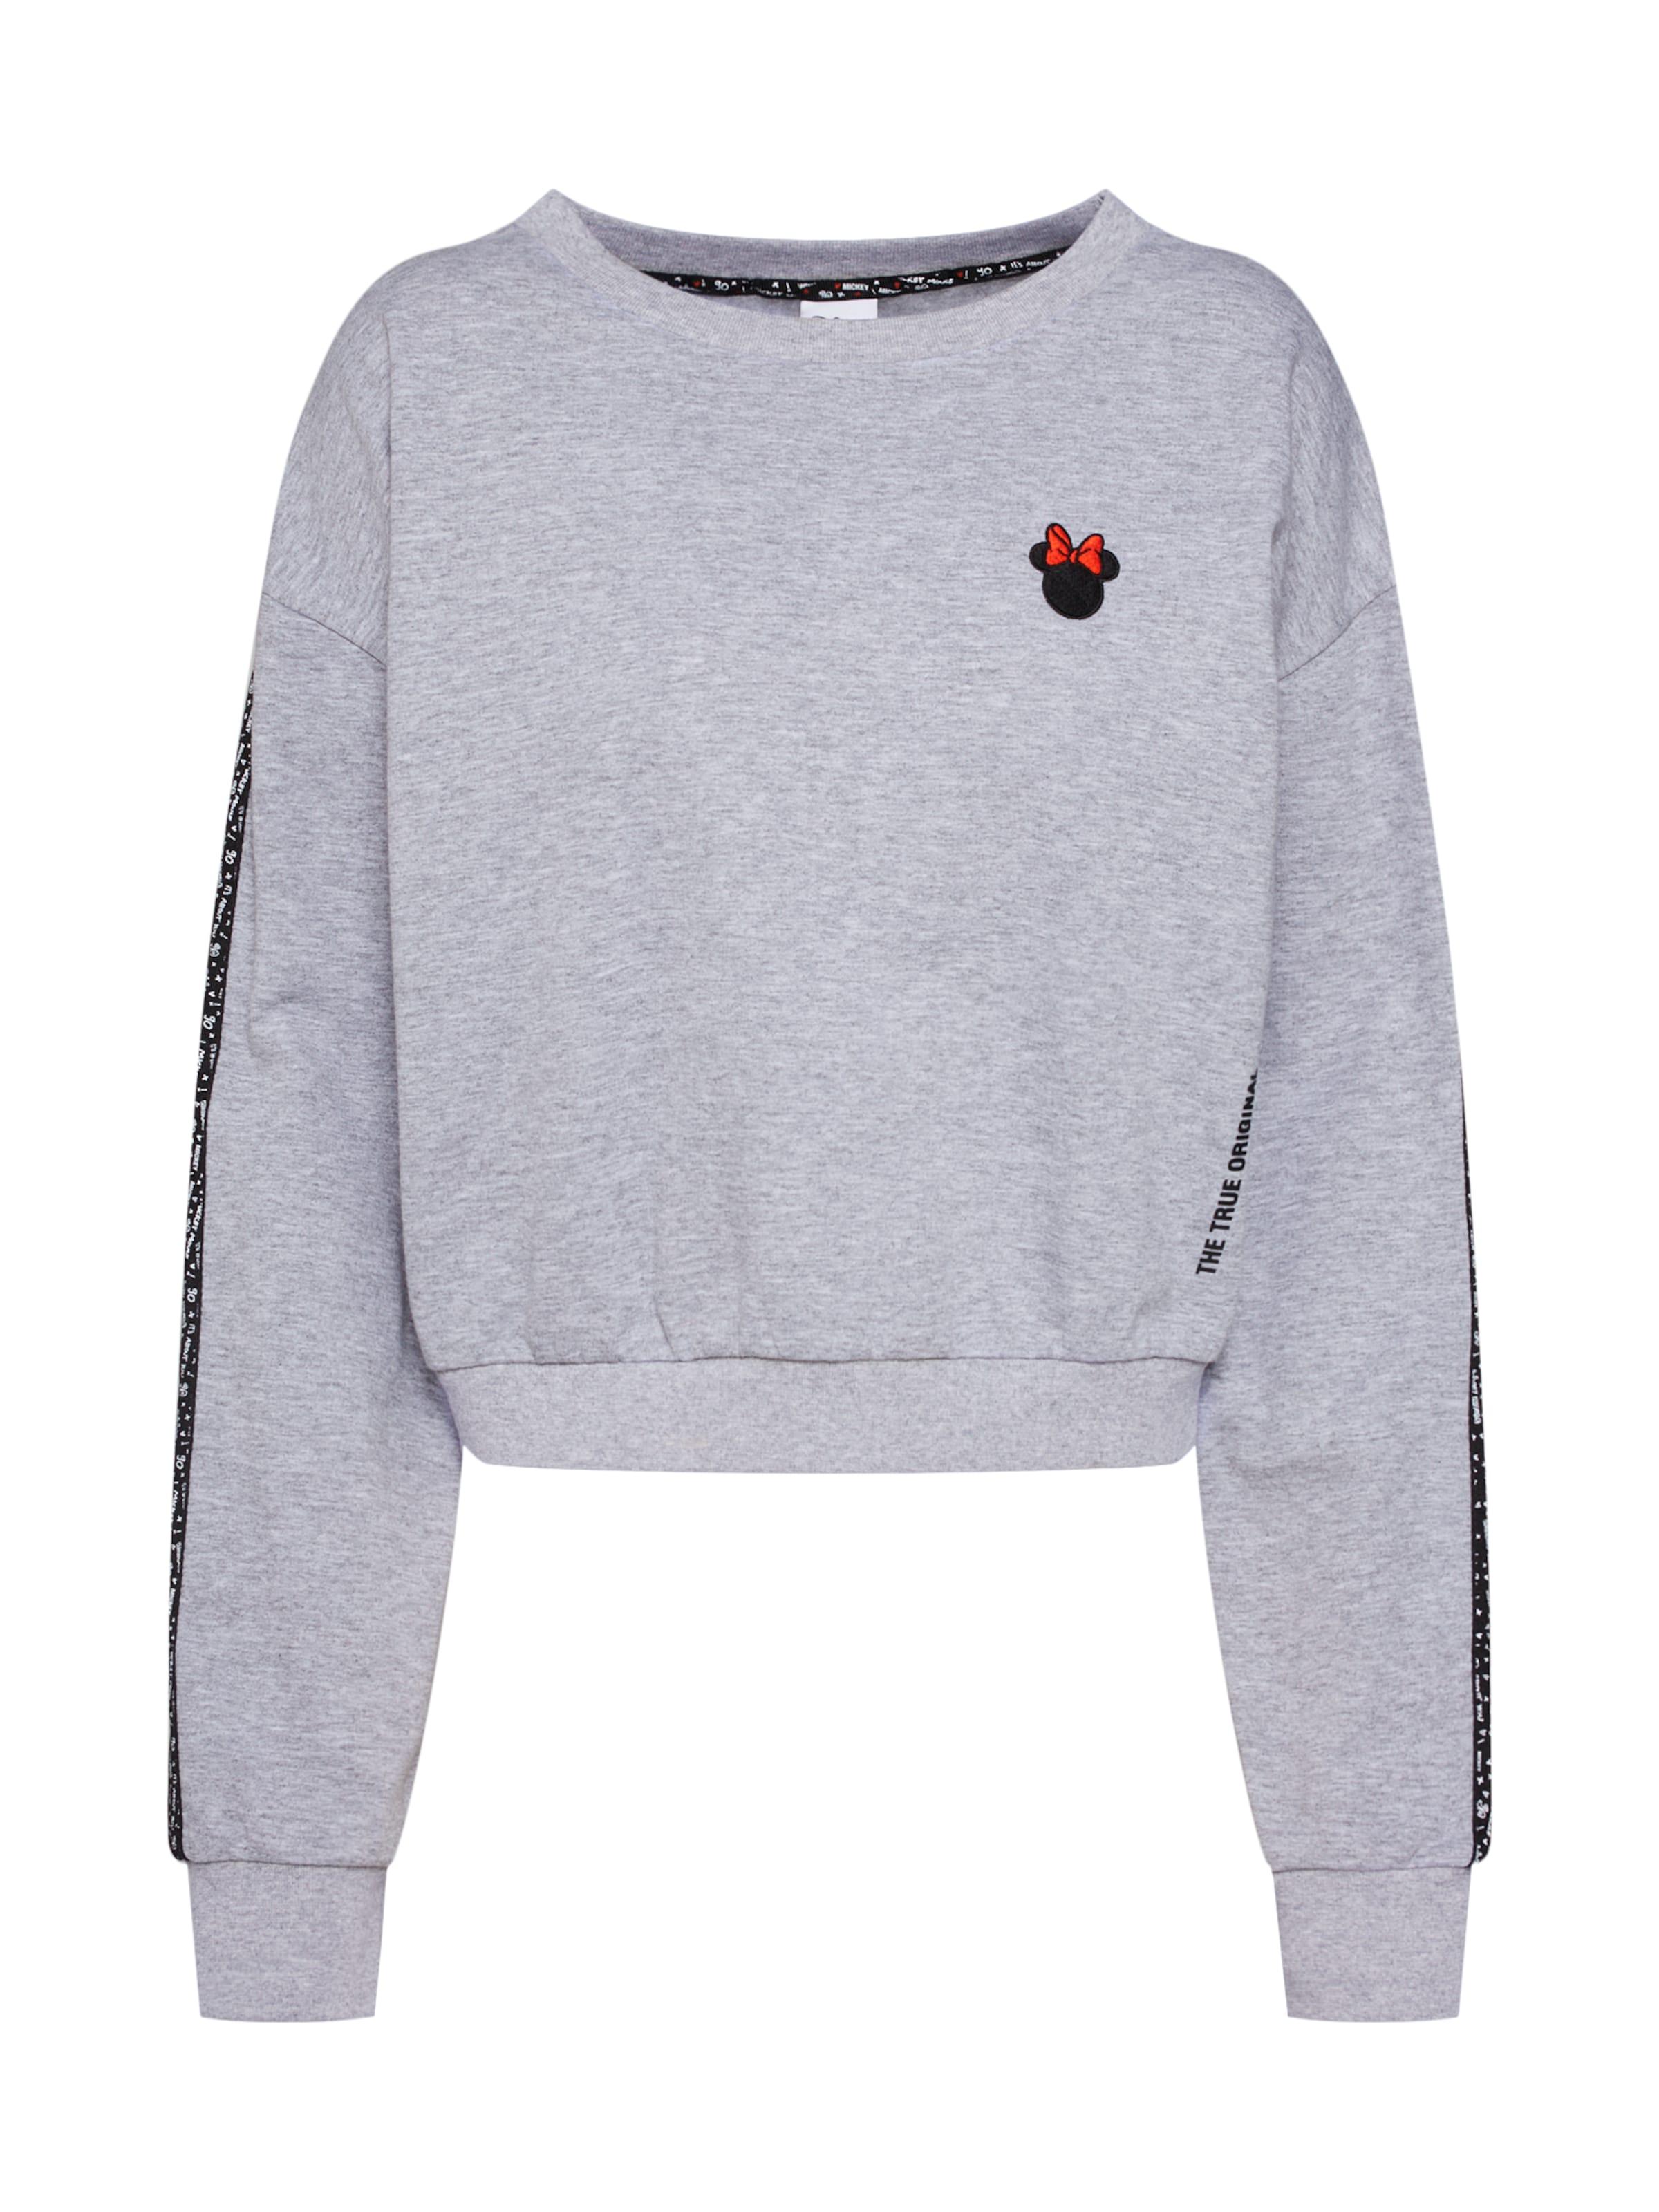 'marie' Gris shirt Disney Xsweat En Yvyb7gf6